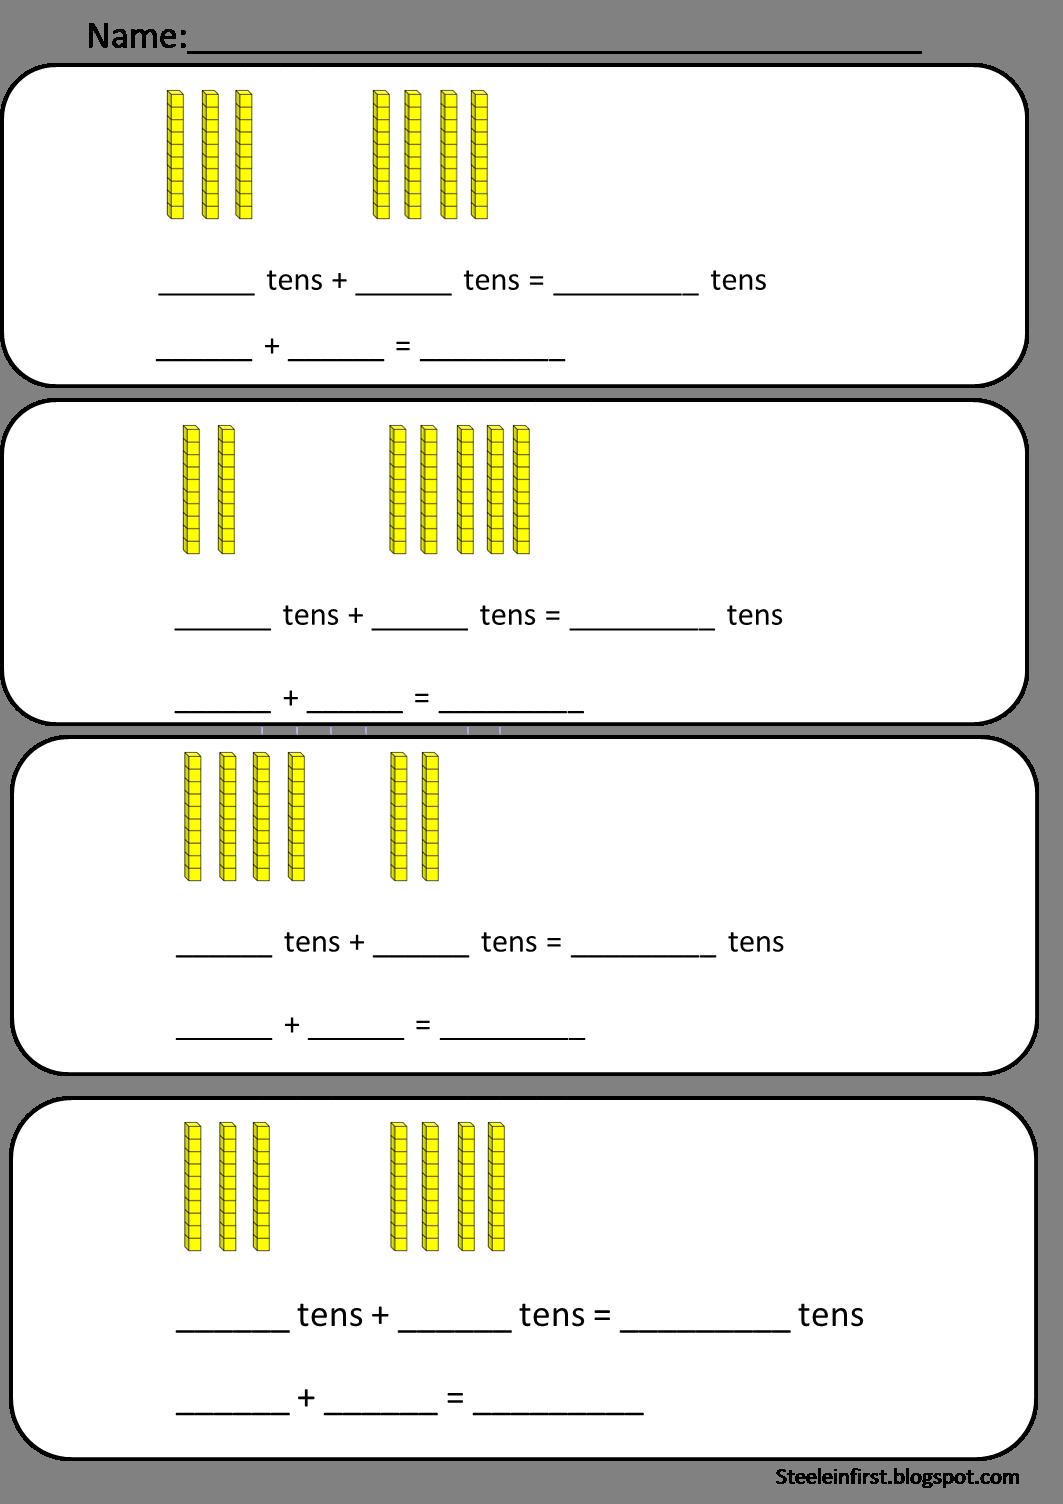 Base-ten-blocks-worksheets & Place Value Blocks